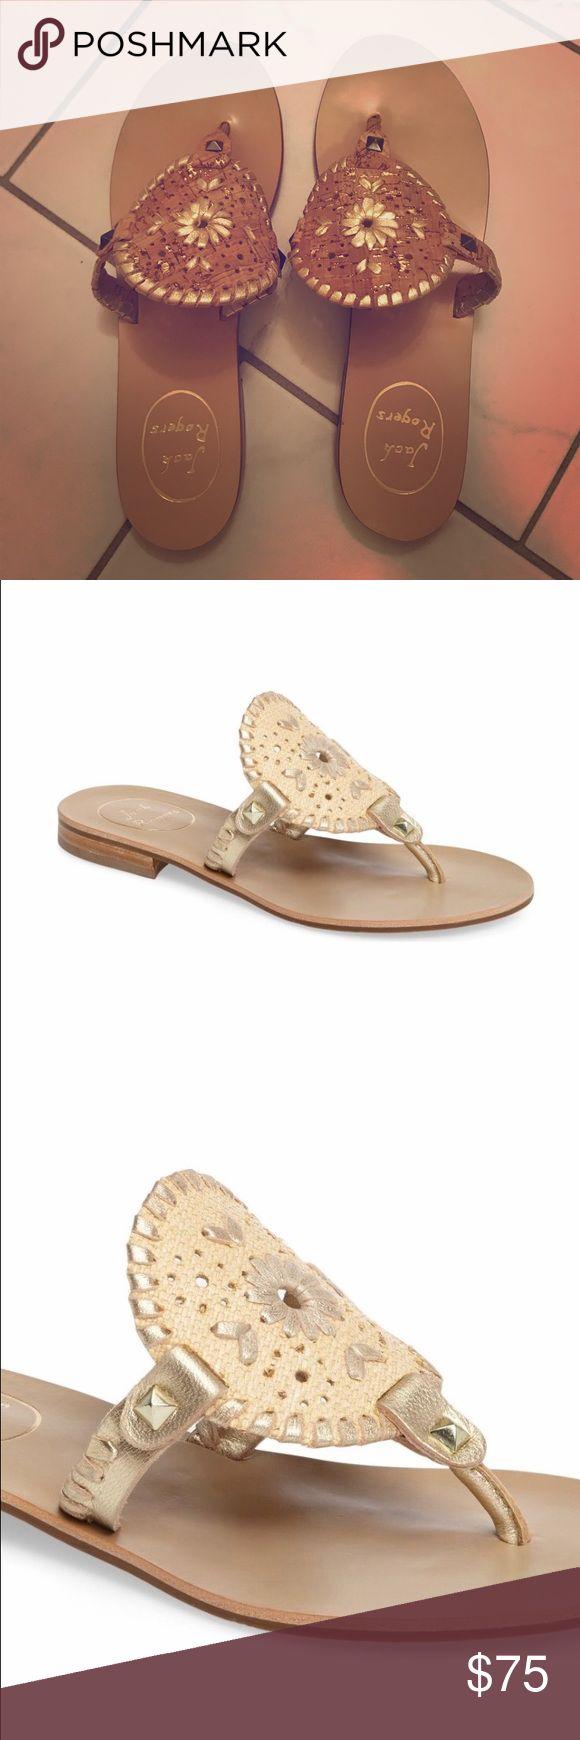 Jack Rodgers Georgica Sandals Natural/ Gold Fabric NEVER WORN! Jack Rodgers Georgica Sandal in natural/ gold fabric. Jack Rogers Shoes Sandals